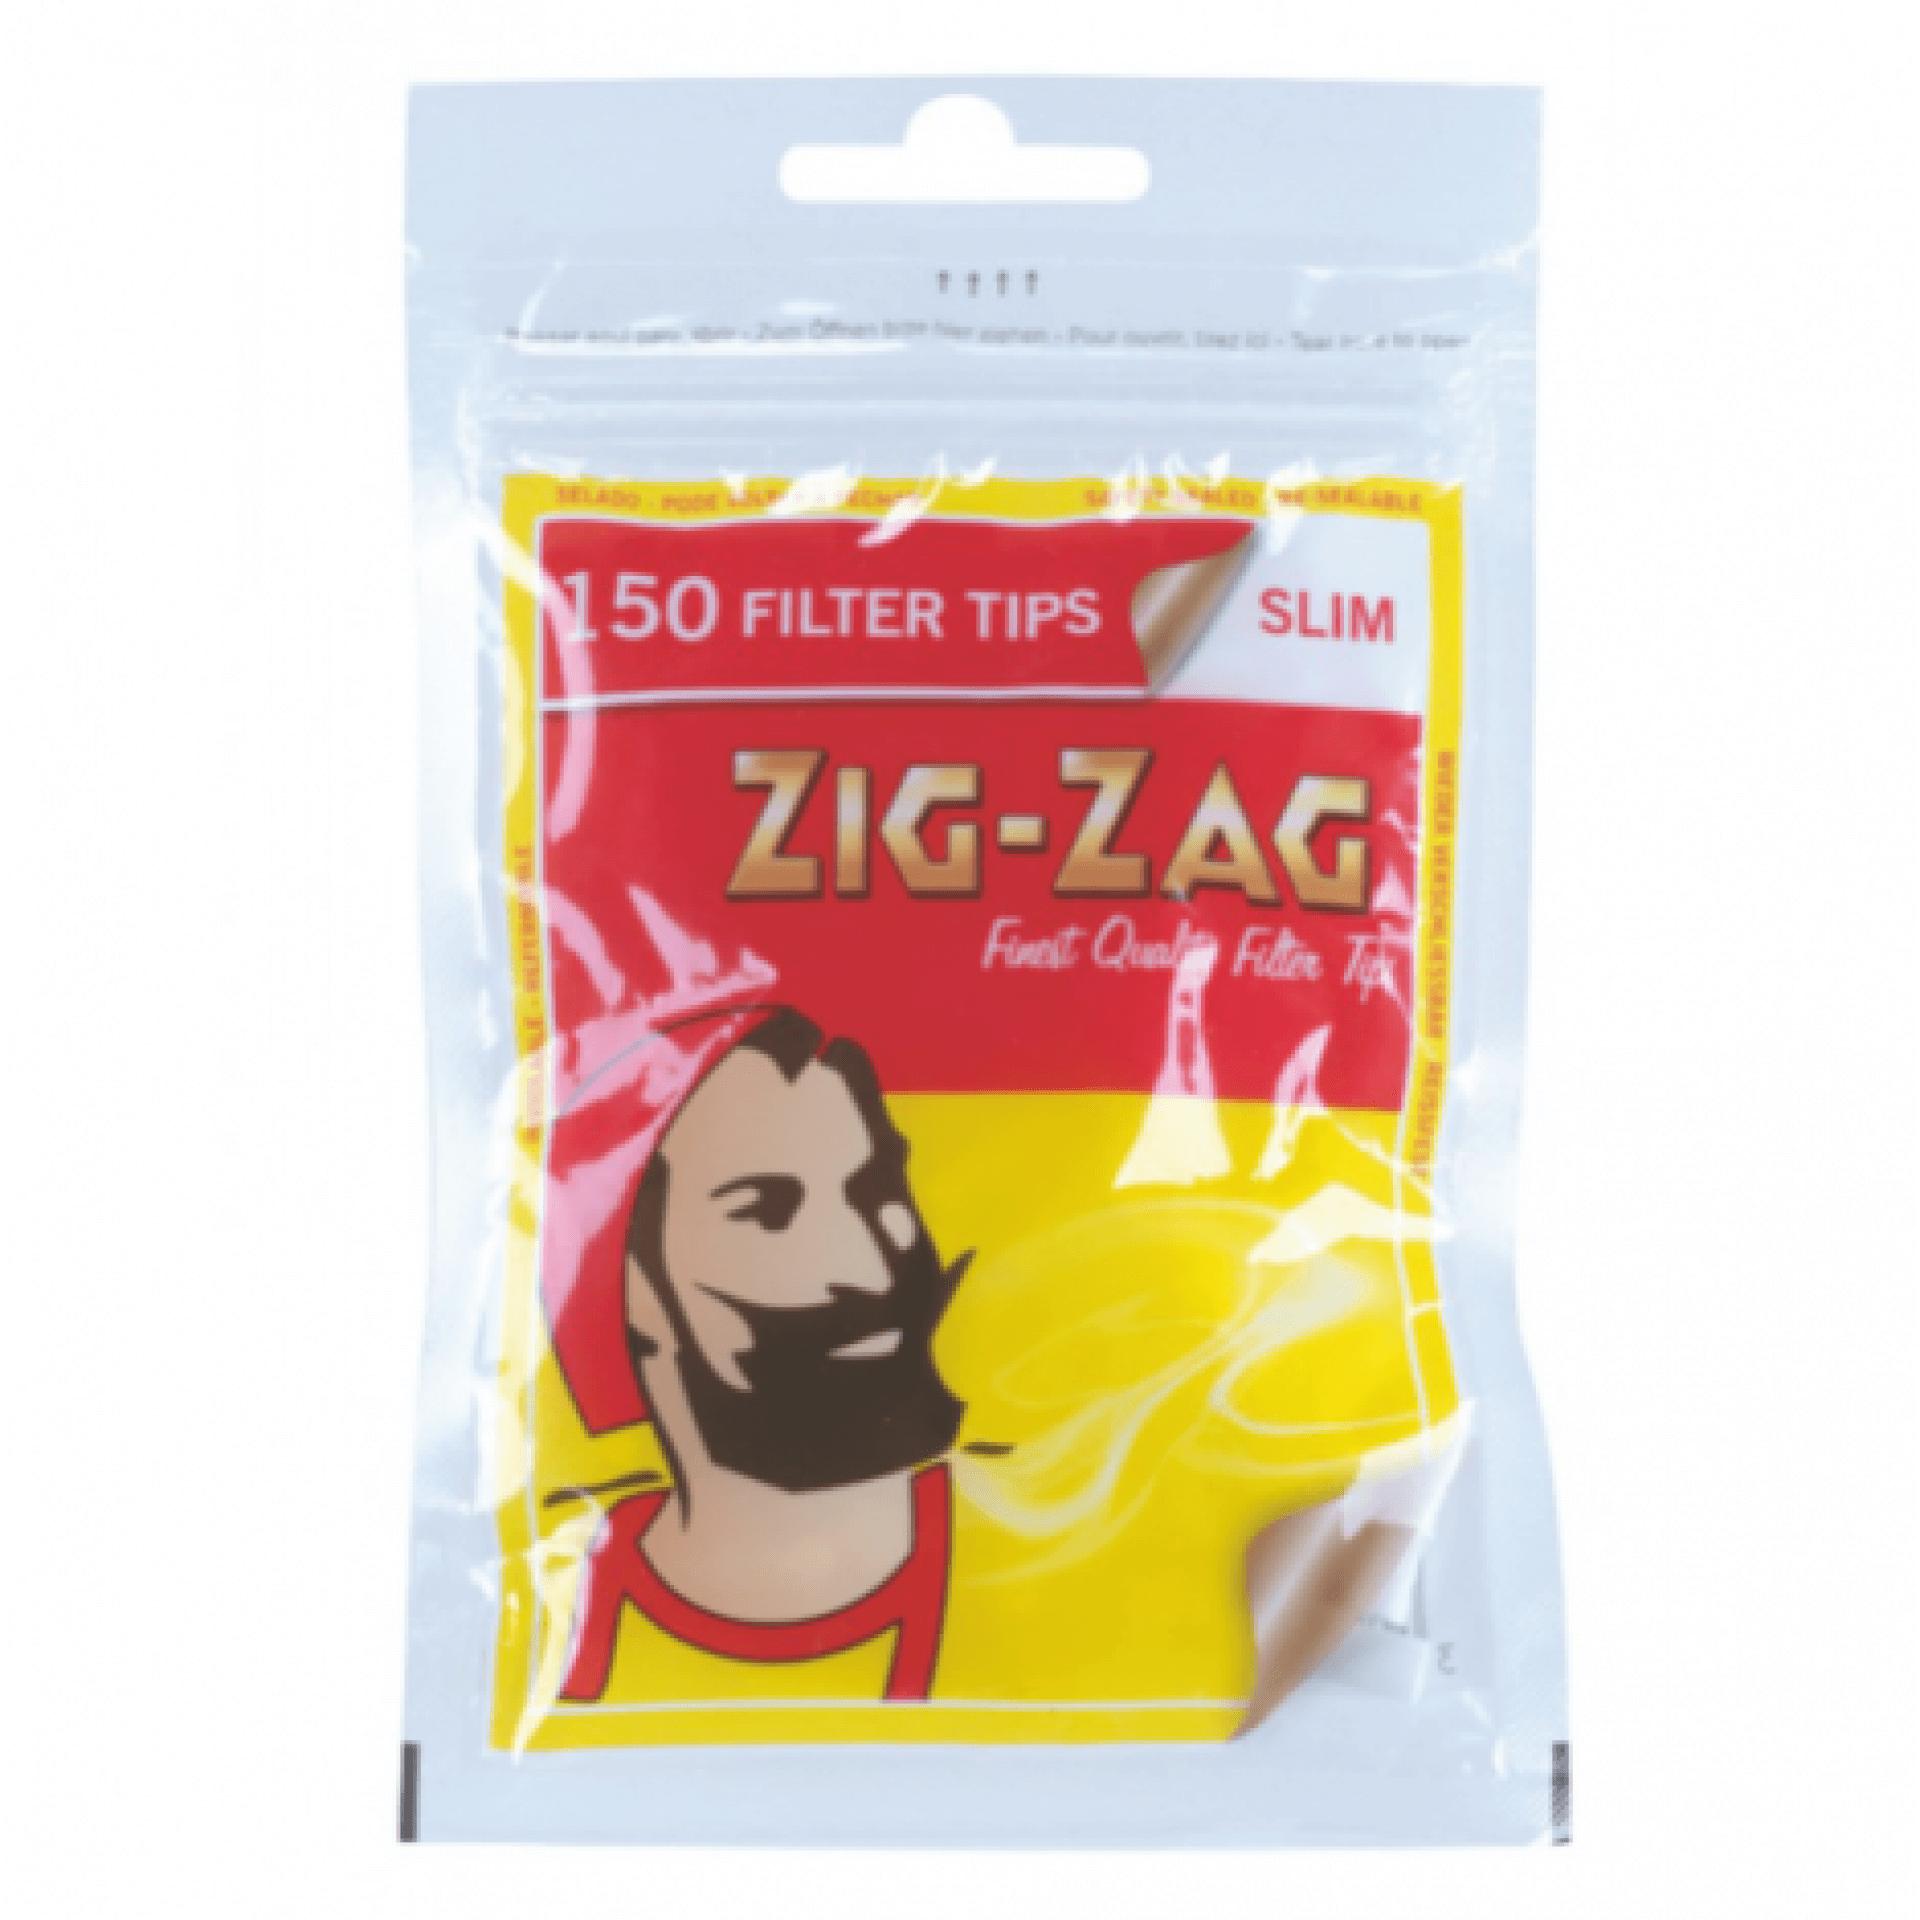 Zig-Zag Slim Filter